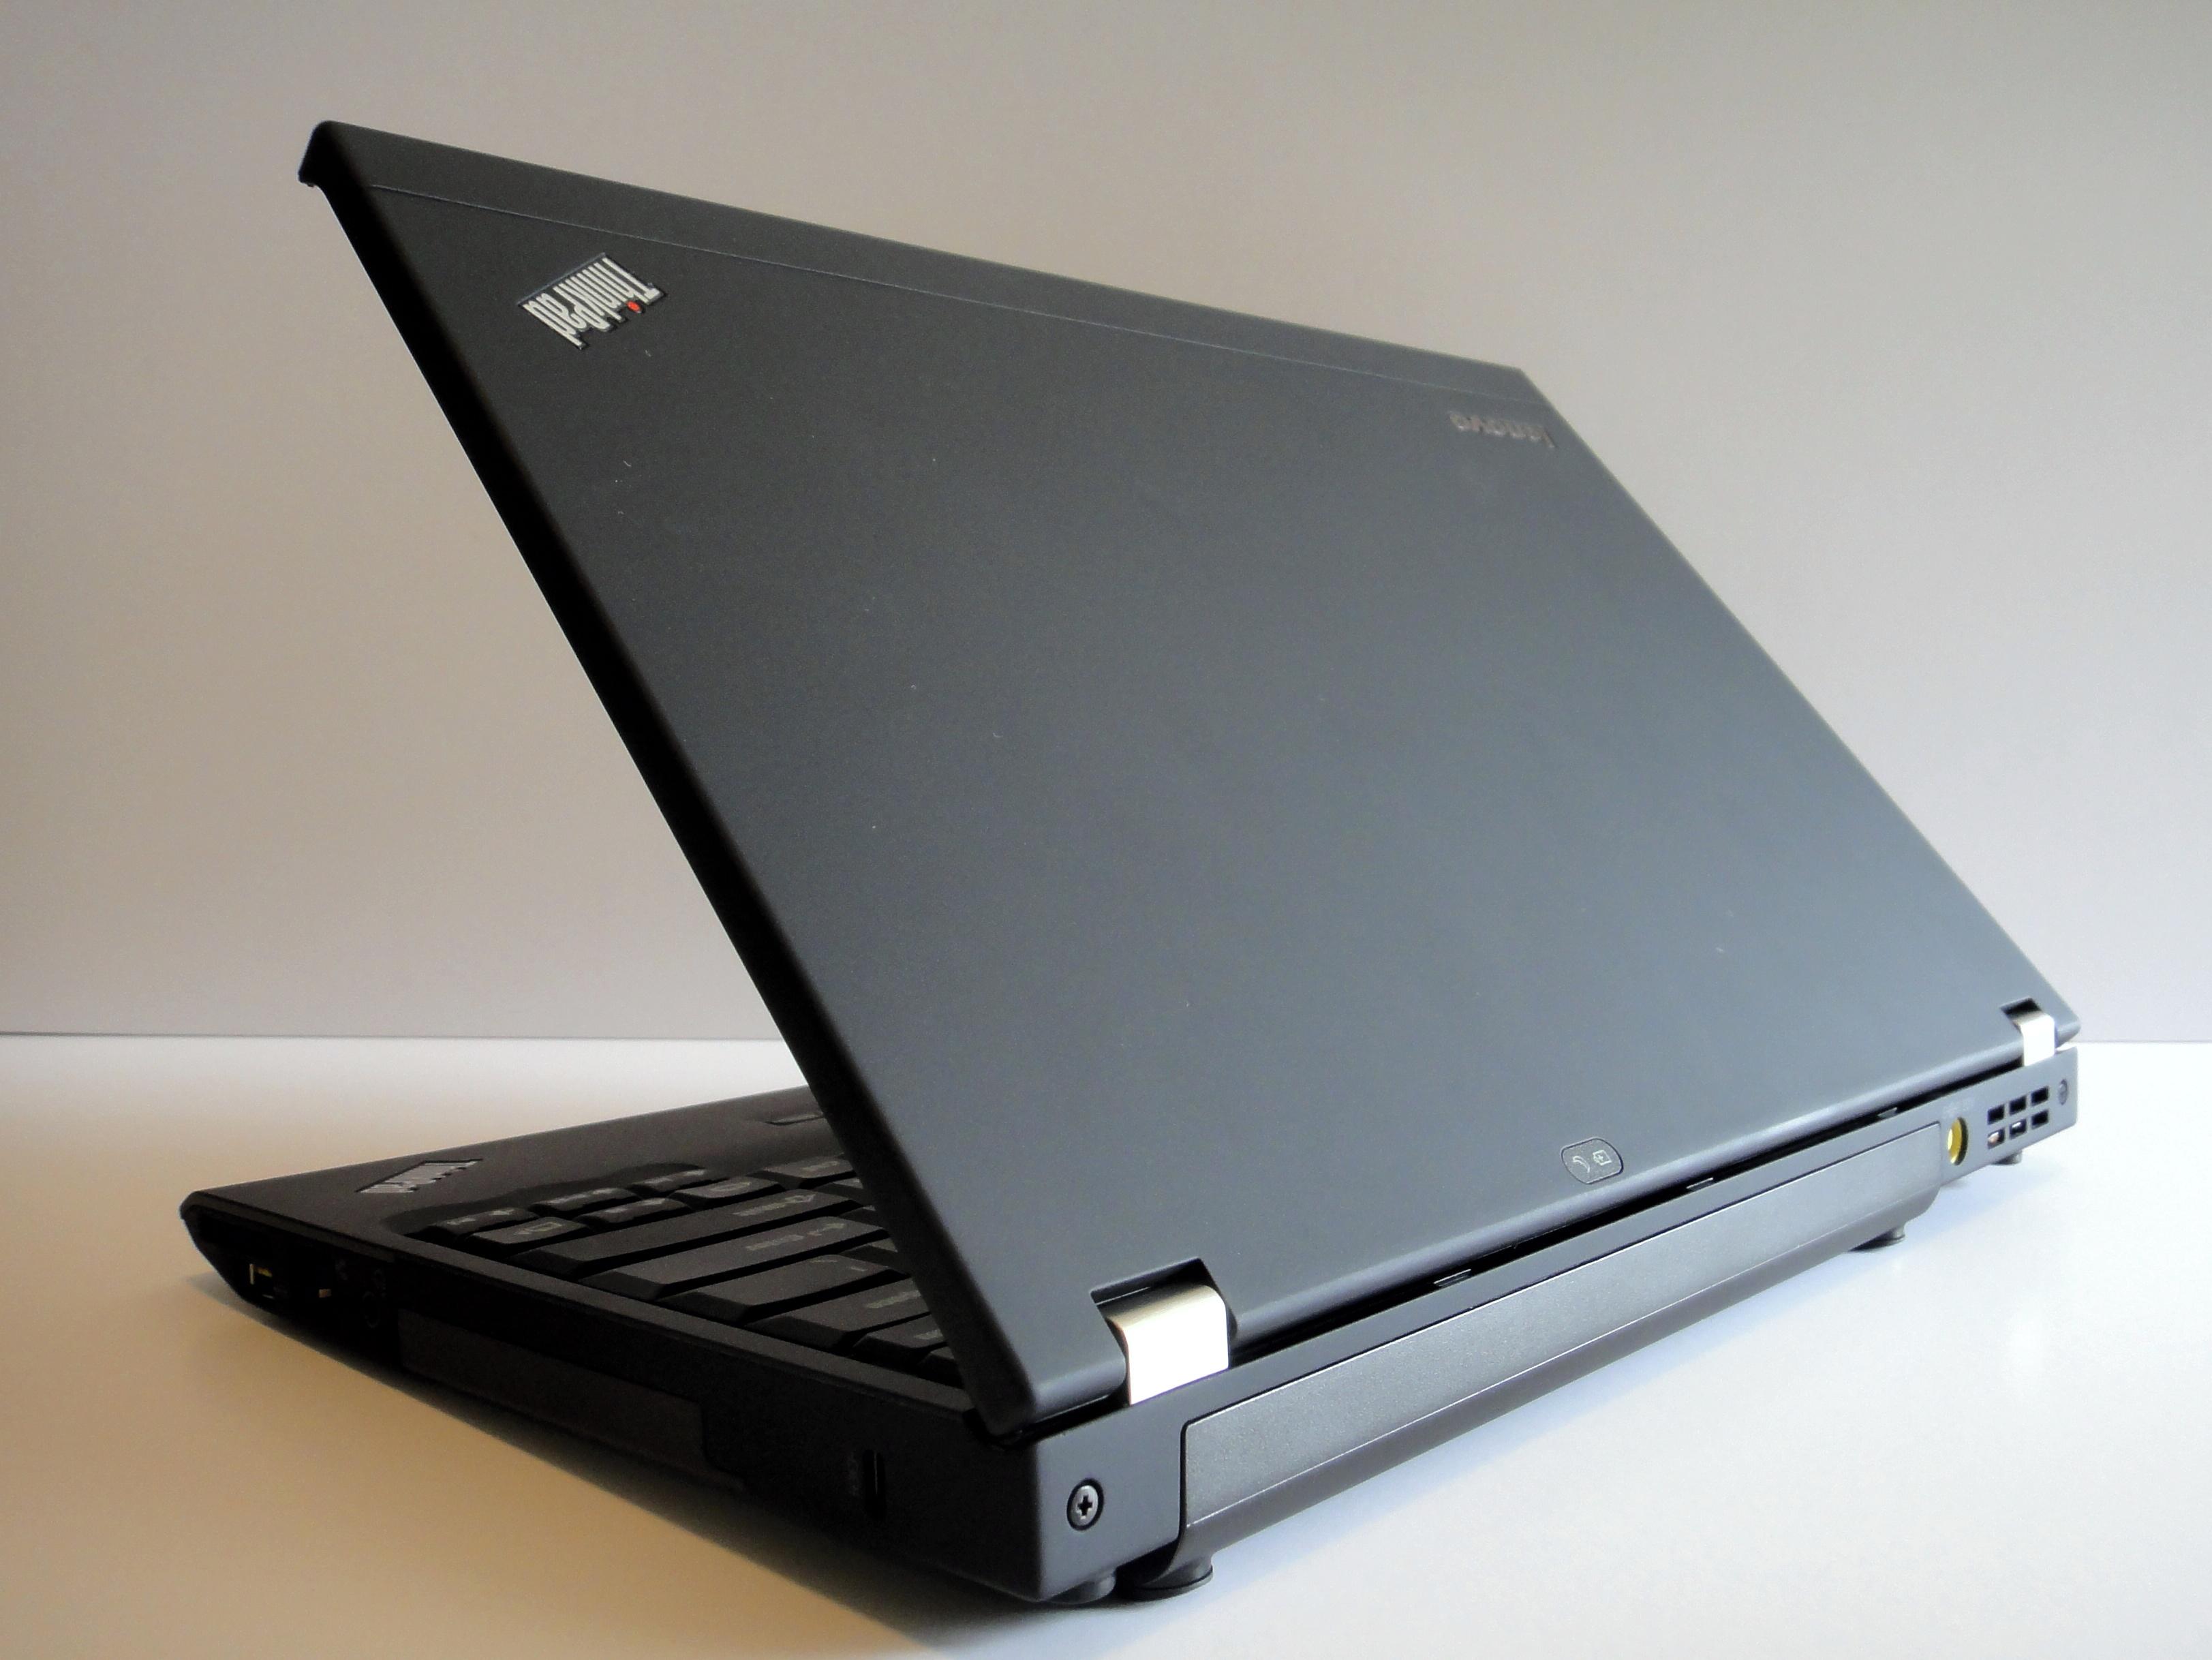 lenovo thinkpad x220 hands on details specs and video rh notebooks com Lenovo X201 Docking Station Lenovo X201 Docking Station